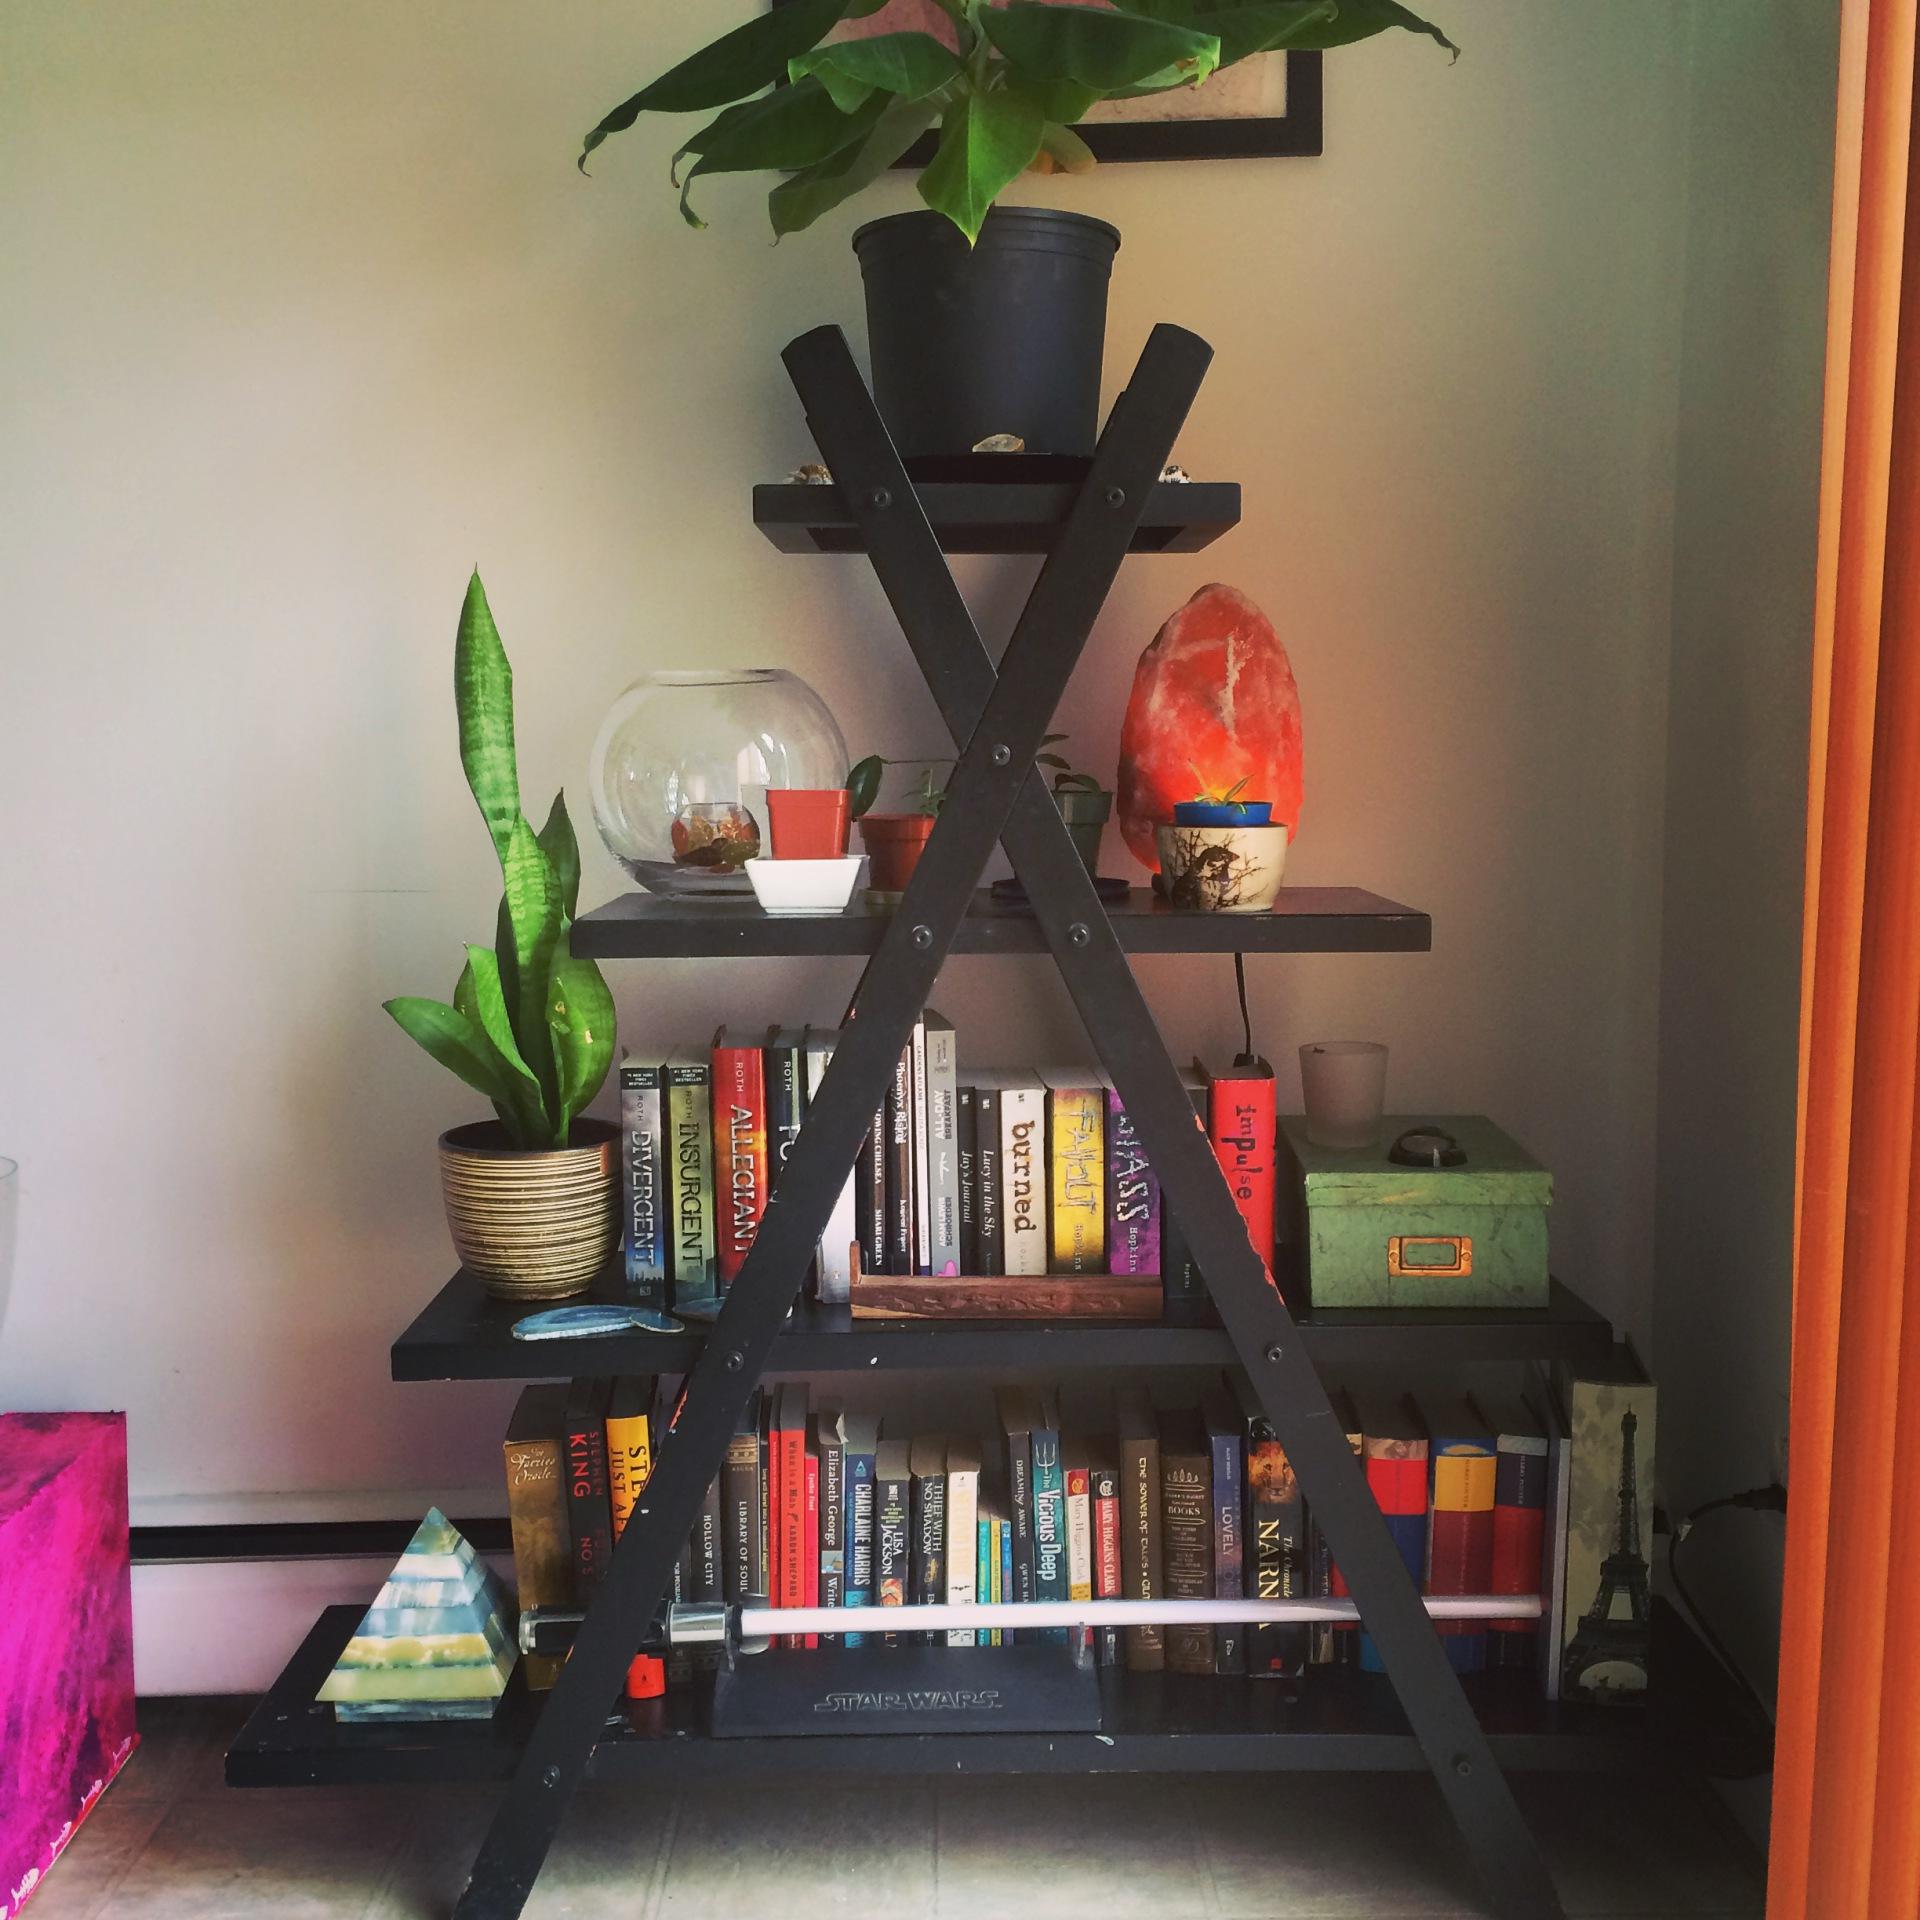 My Newest Bookshelf.